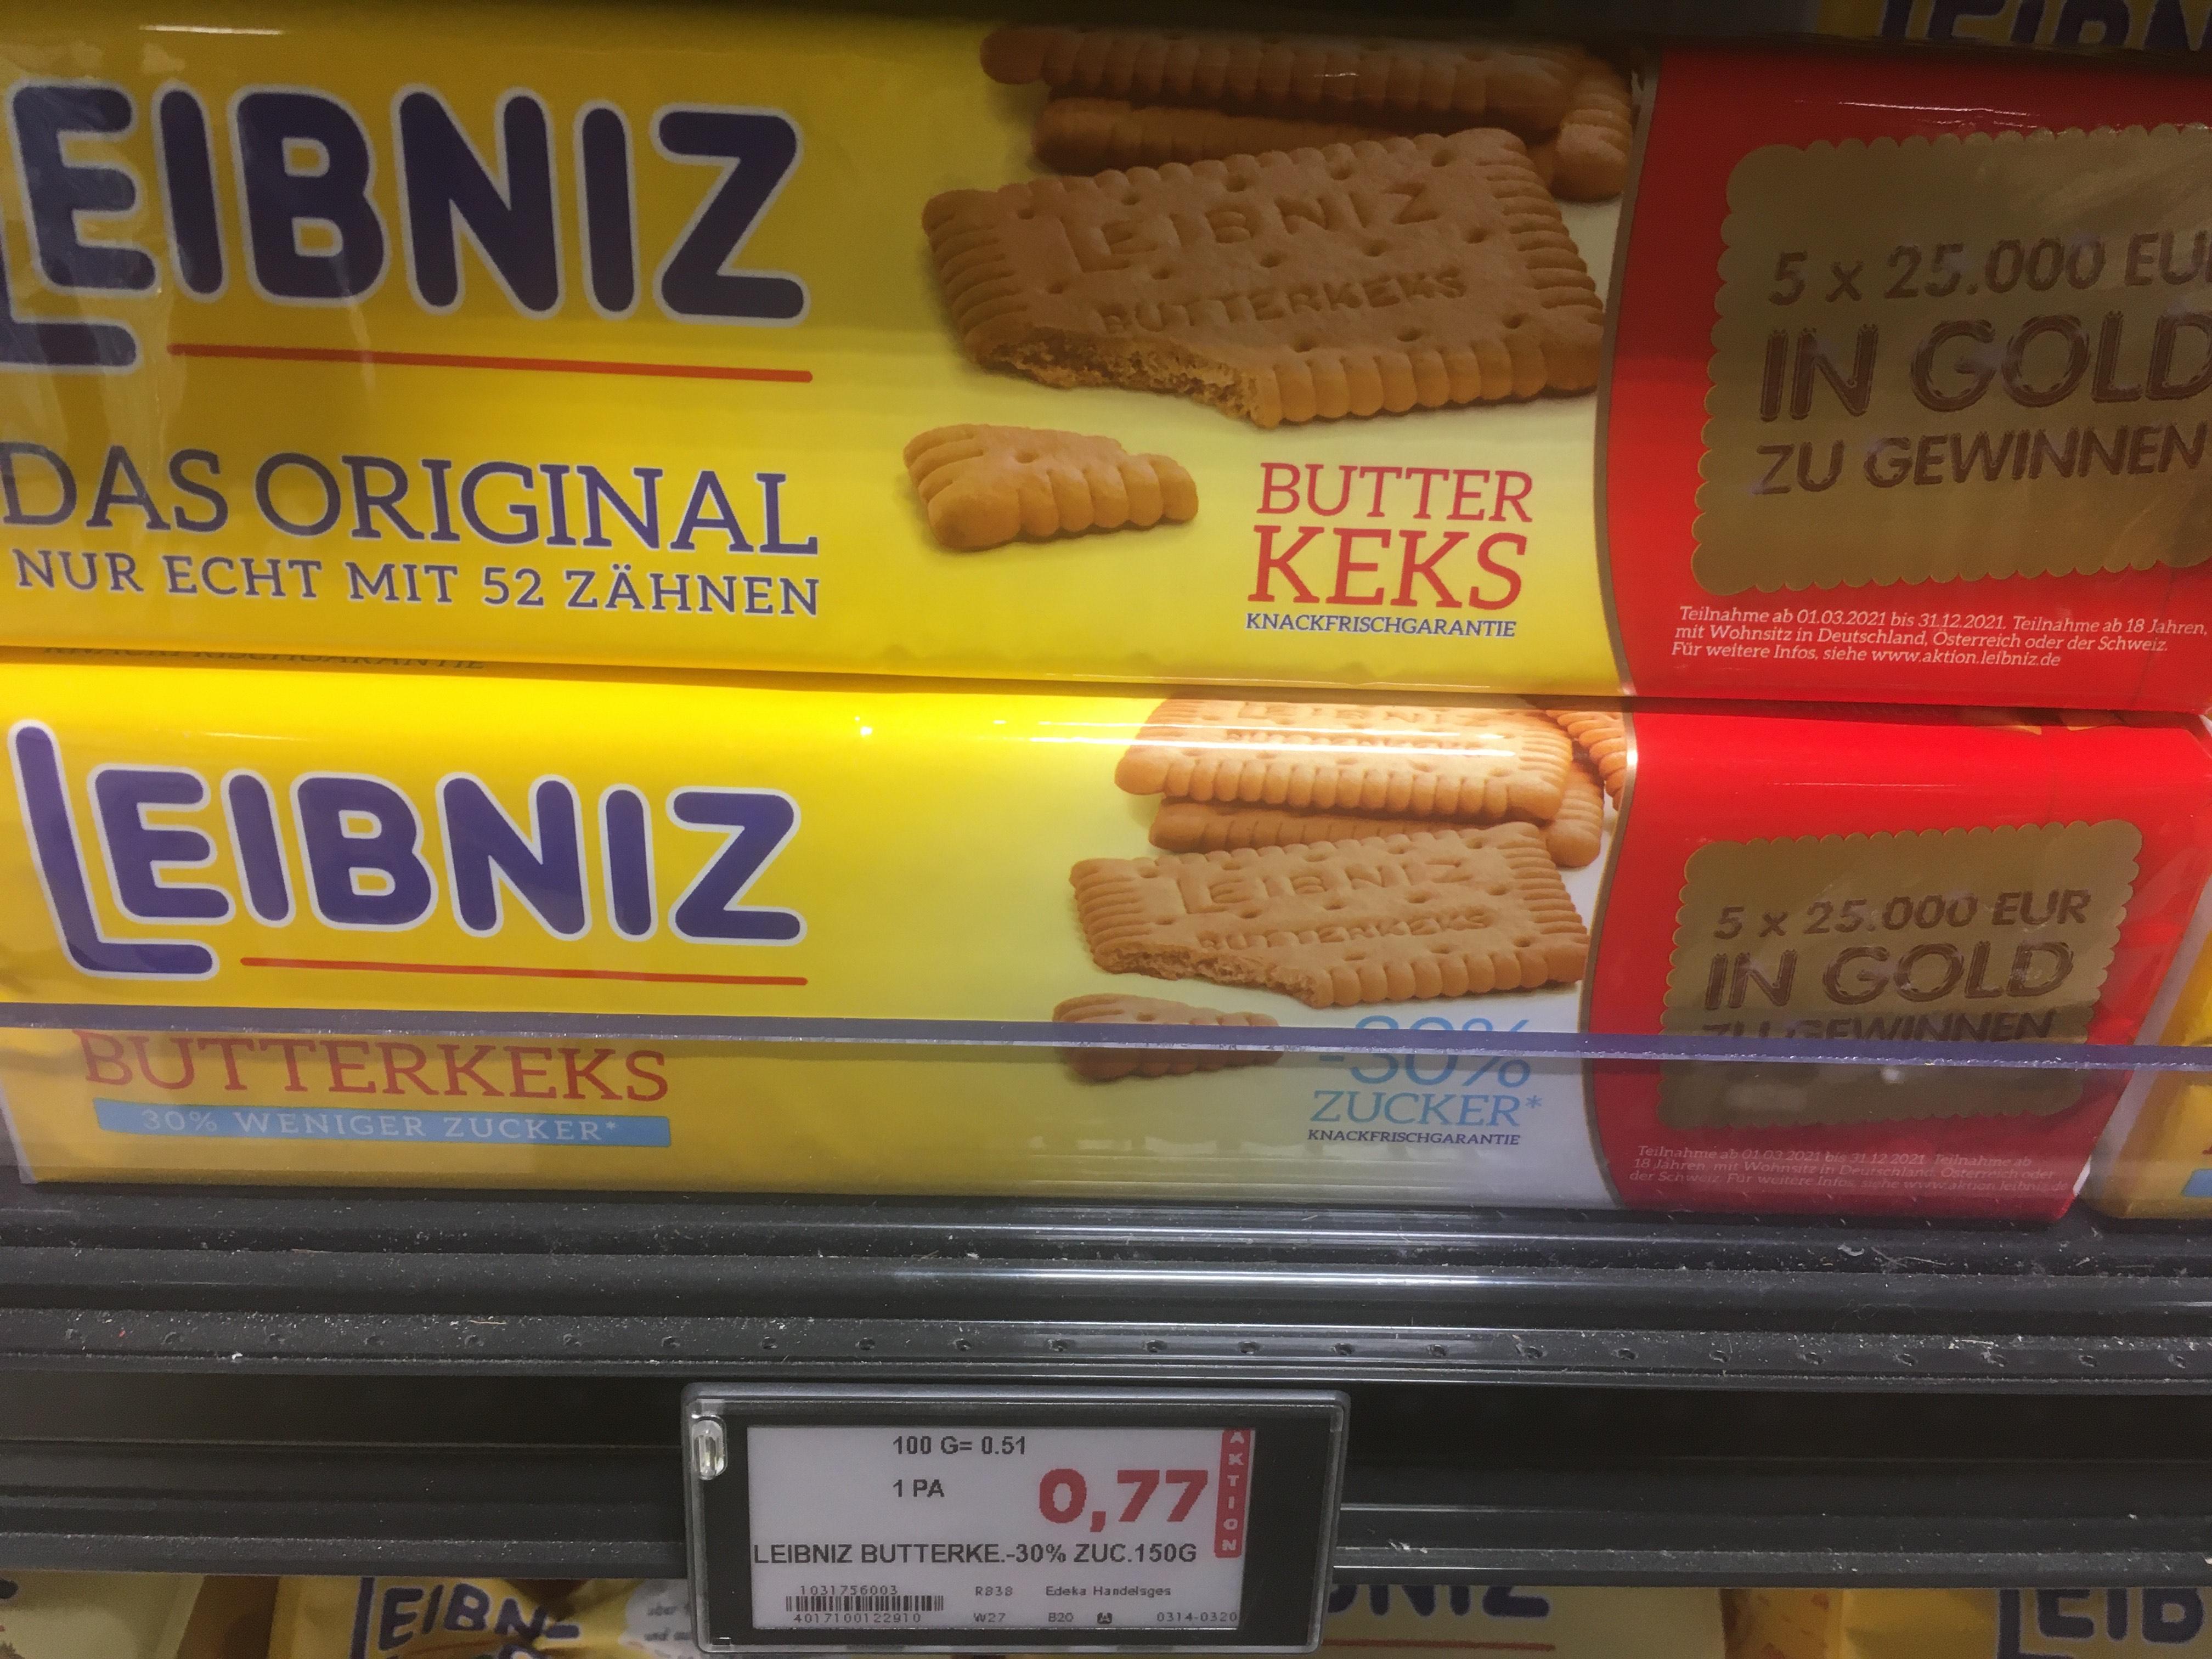 Leibniz Butterkeks verschiedene Sorten